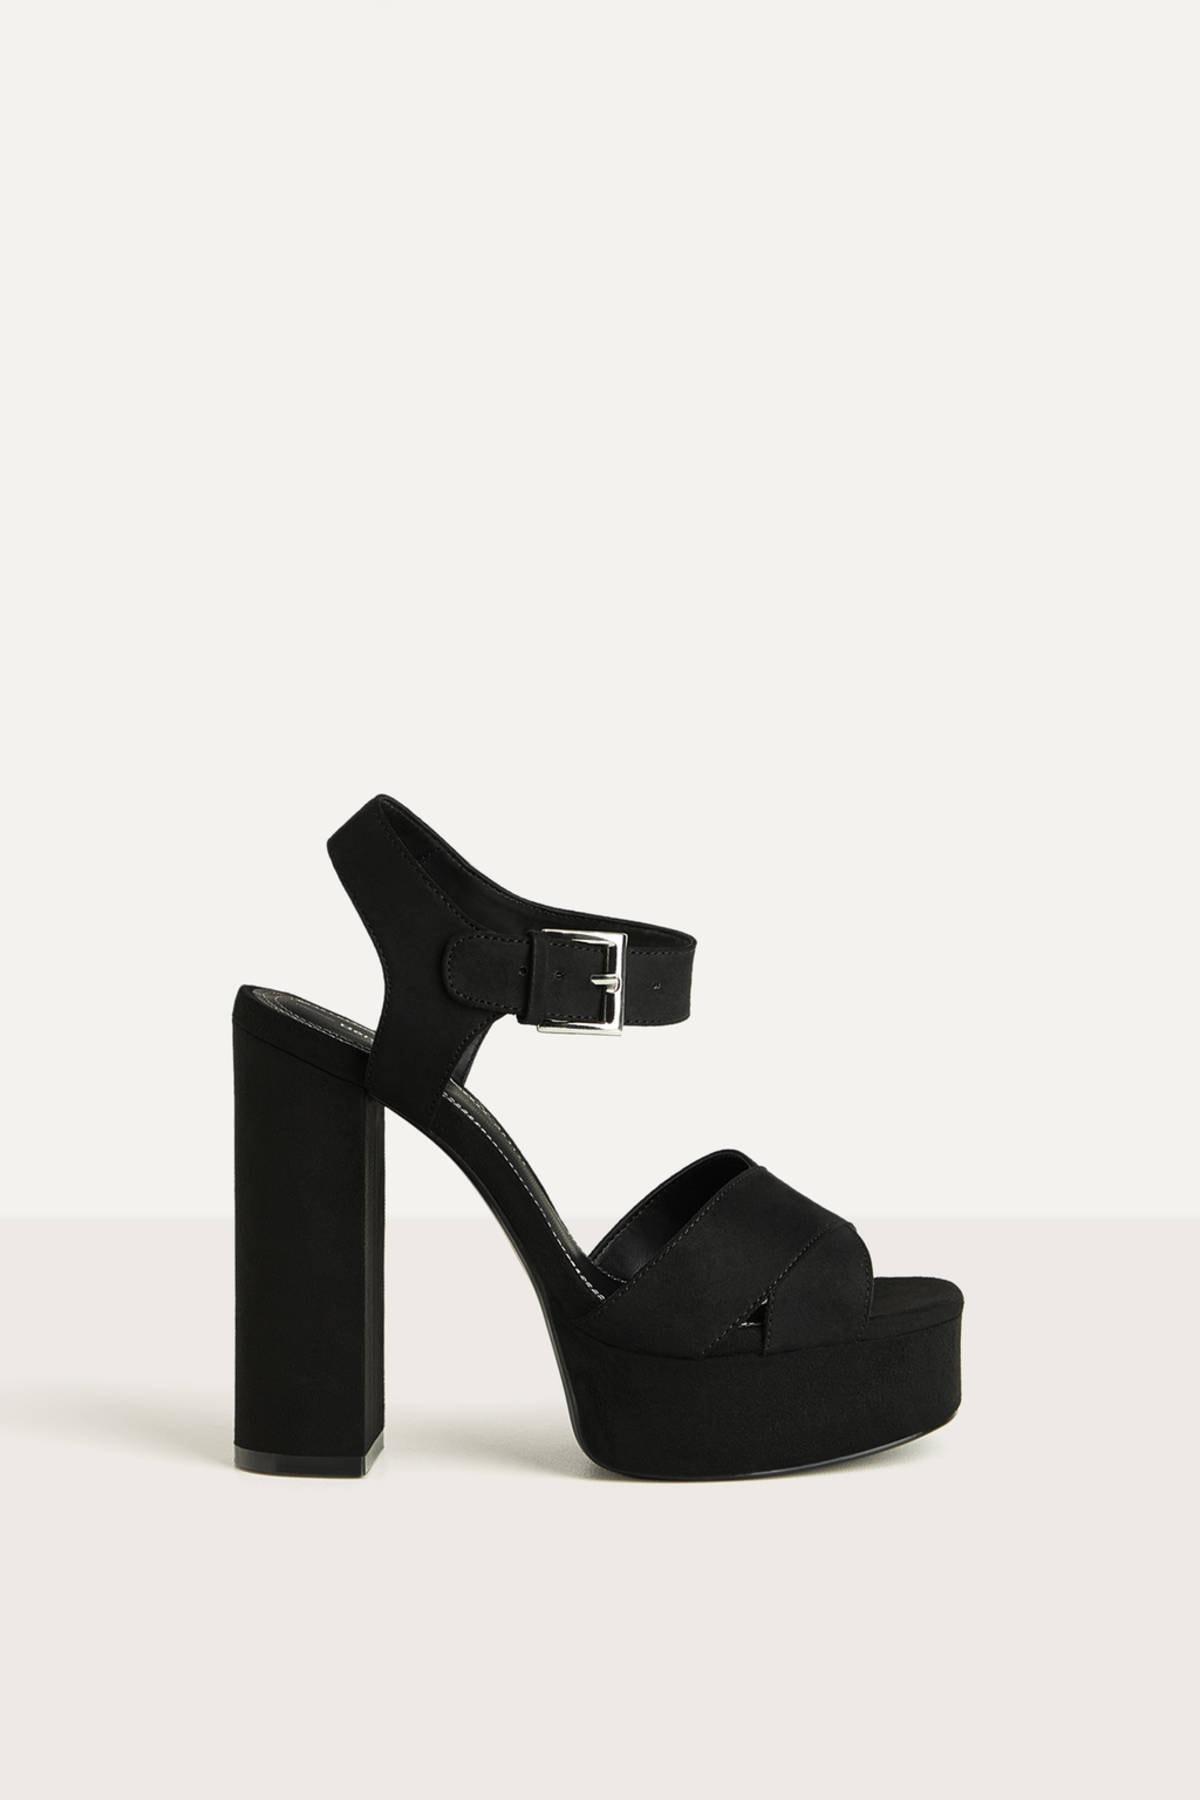 Bershka Kadın Siyah Platform Topuk Sandalet 11702660 0